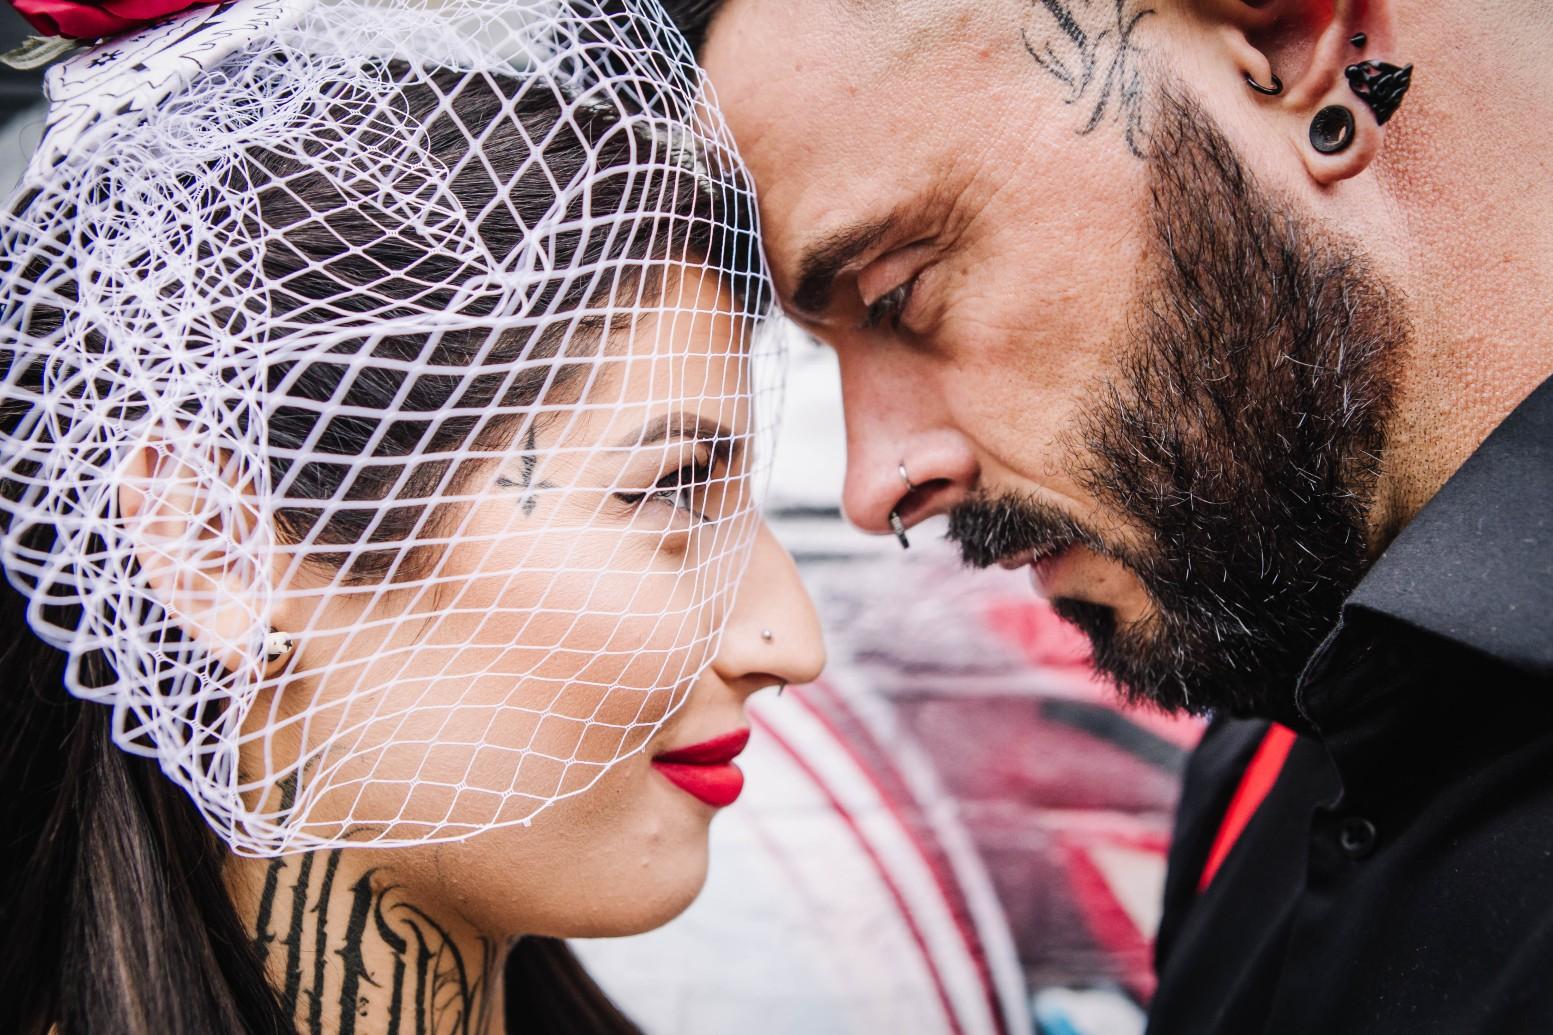 Urban Rockabilly Wedding - Urban Wedding - Magpie-Eye Photography- Unconventional Wedding- alternative couple wedding photos